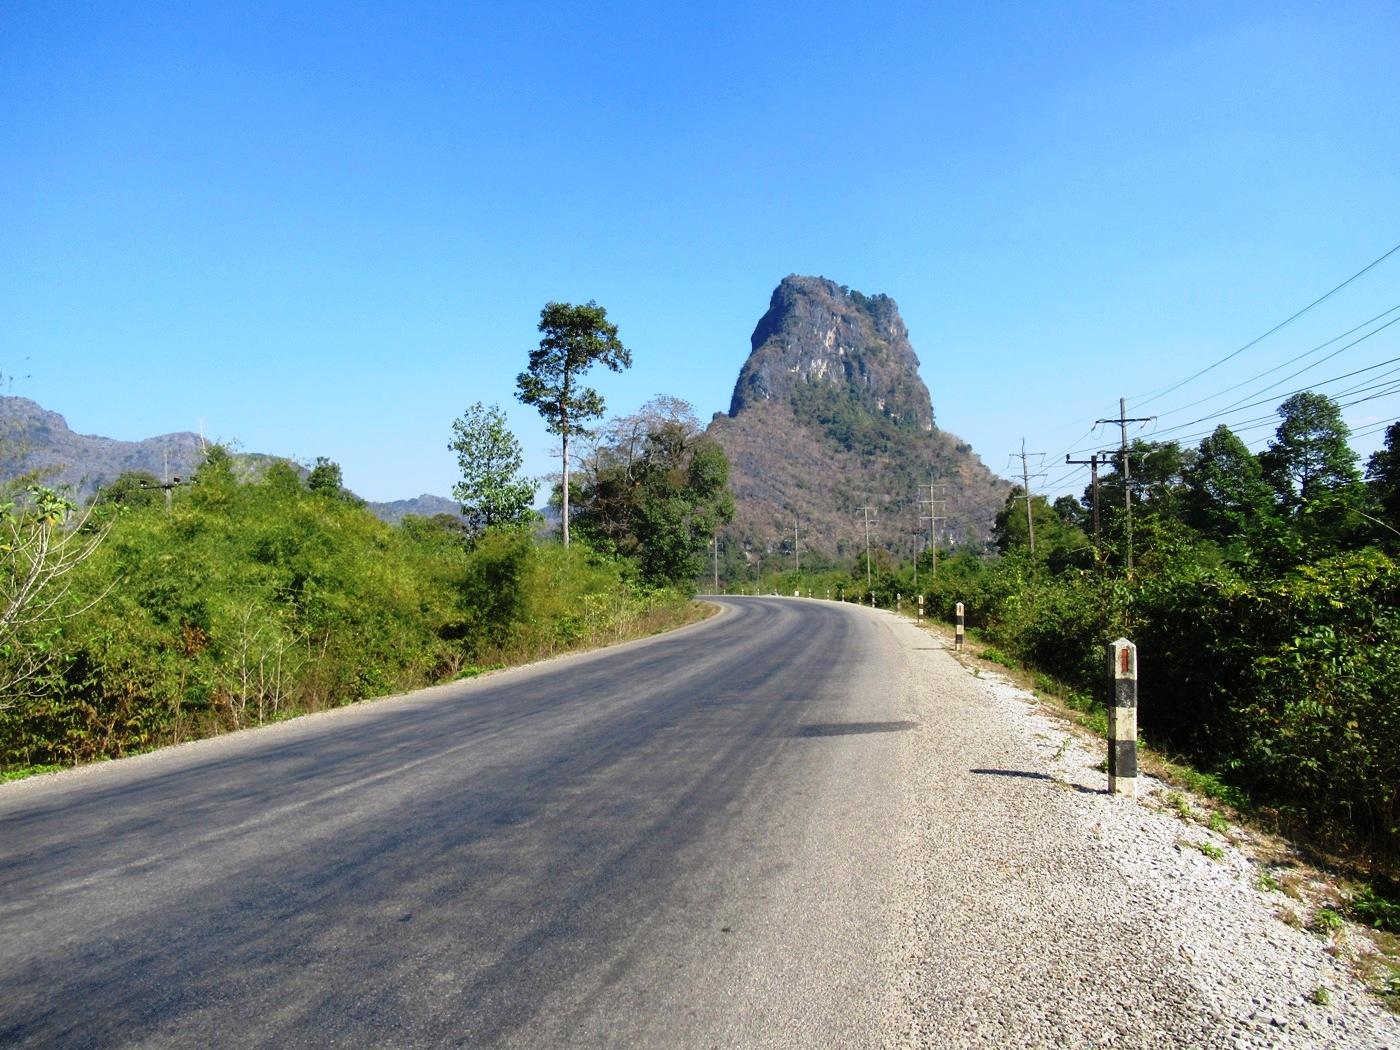 2019-12-laos-thakhek-loop-dia-1-12-carretera